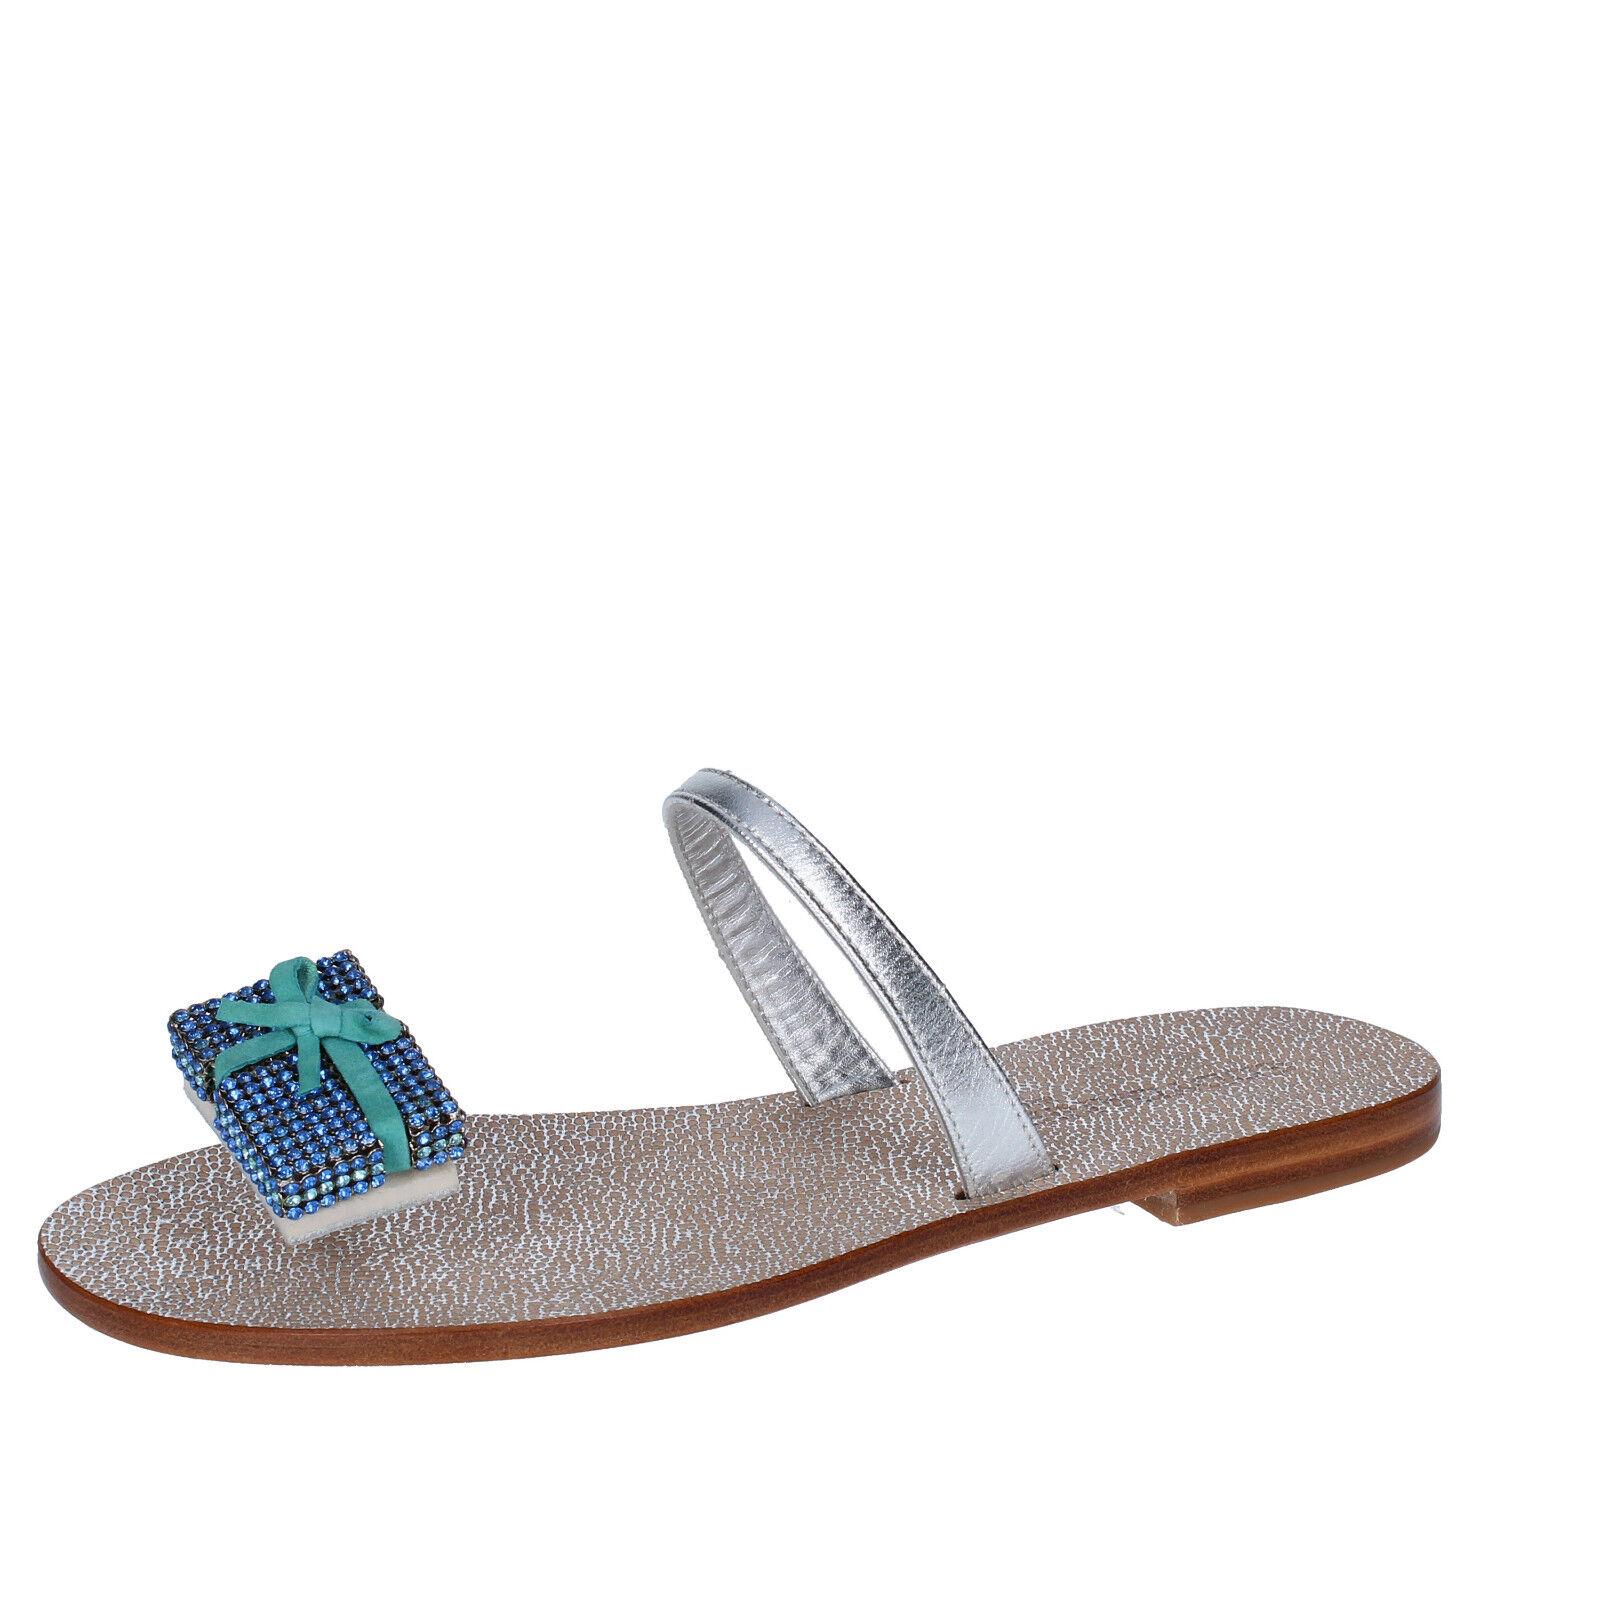 Zapatos para para para mujer Eddy Daniele 4 (EU 37) Sandalias Plata Cuero Swarovski AW434  ventas de salida